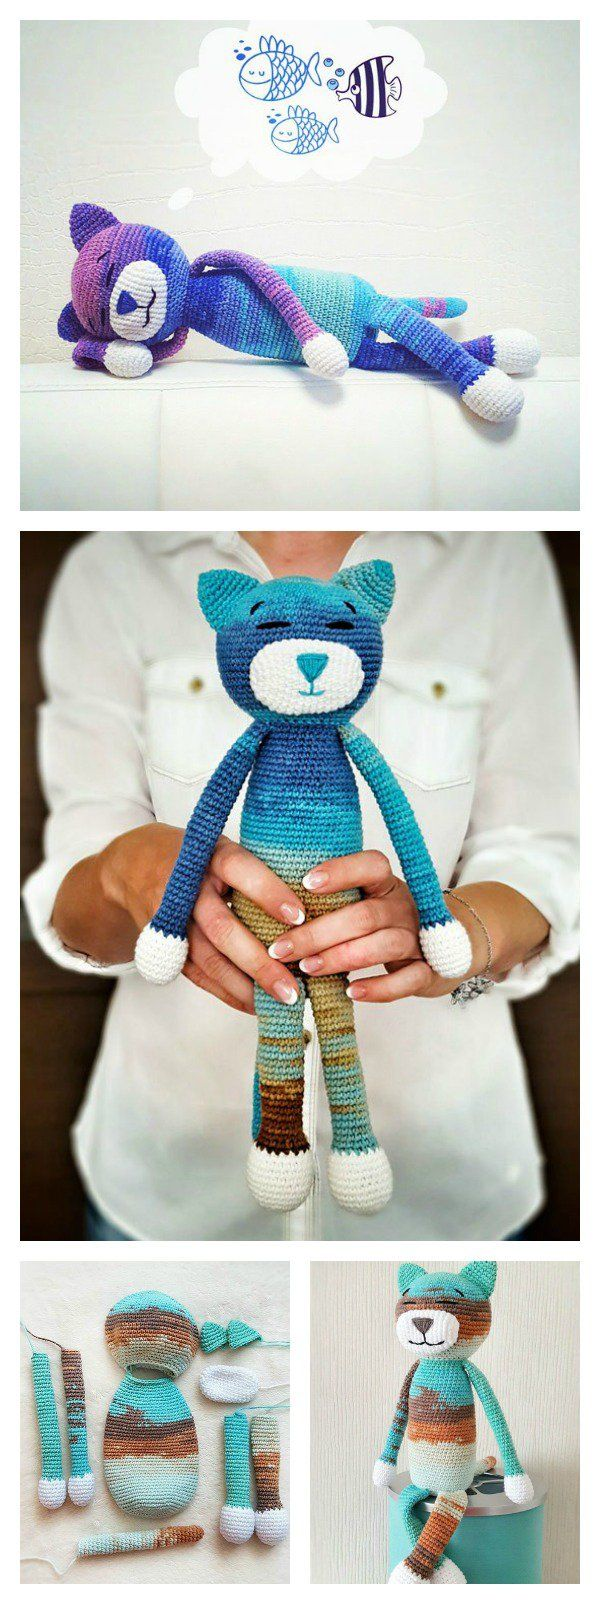 Crochet Amineko Cat with Free Pattern | Frei, Muster und Häkeln